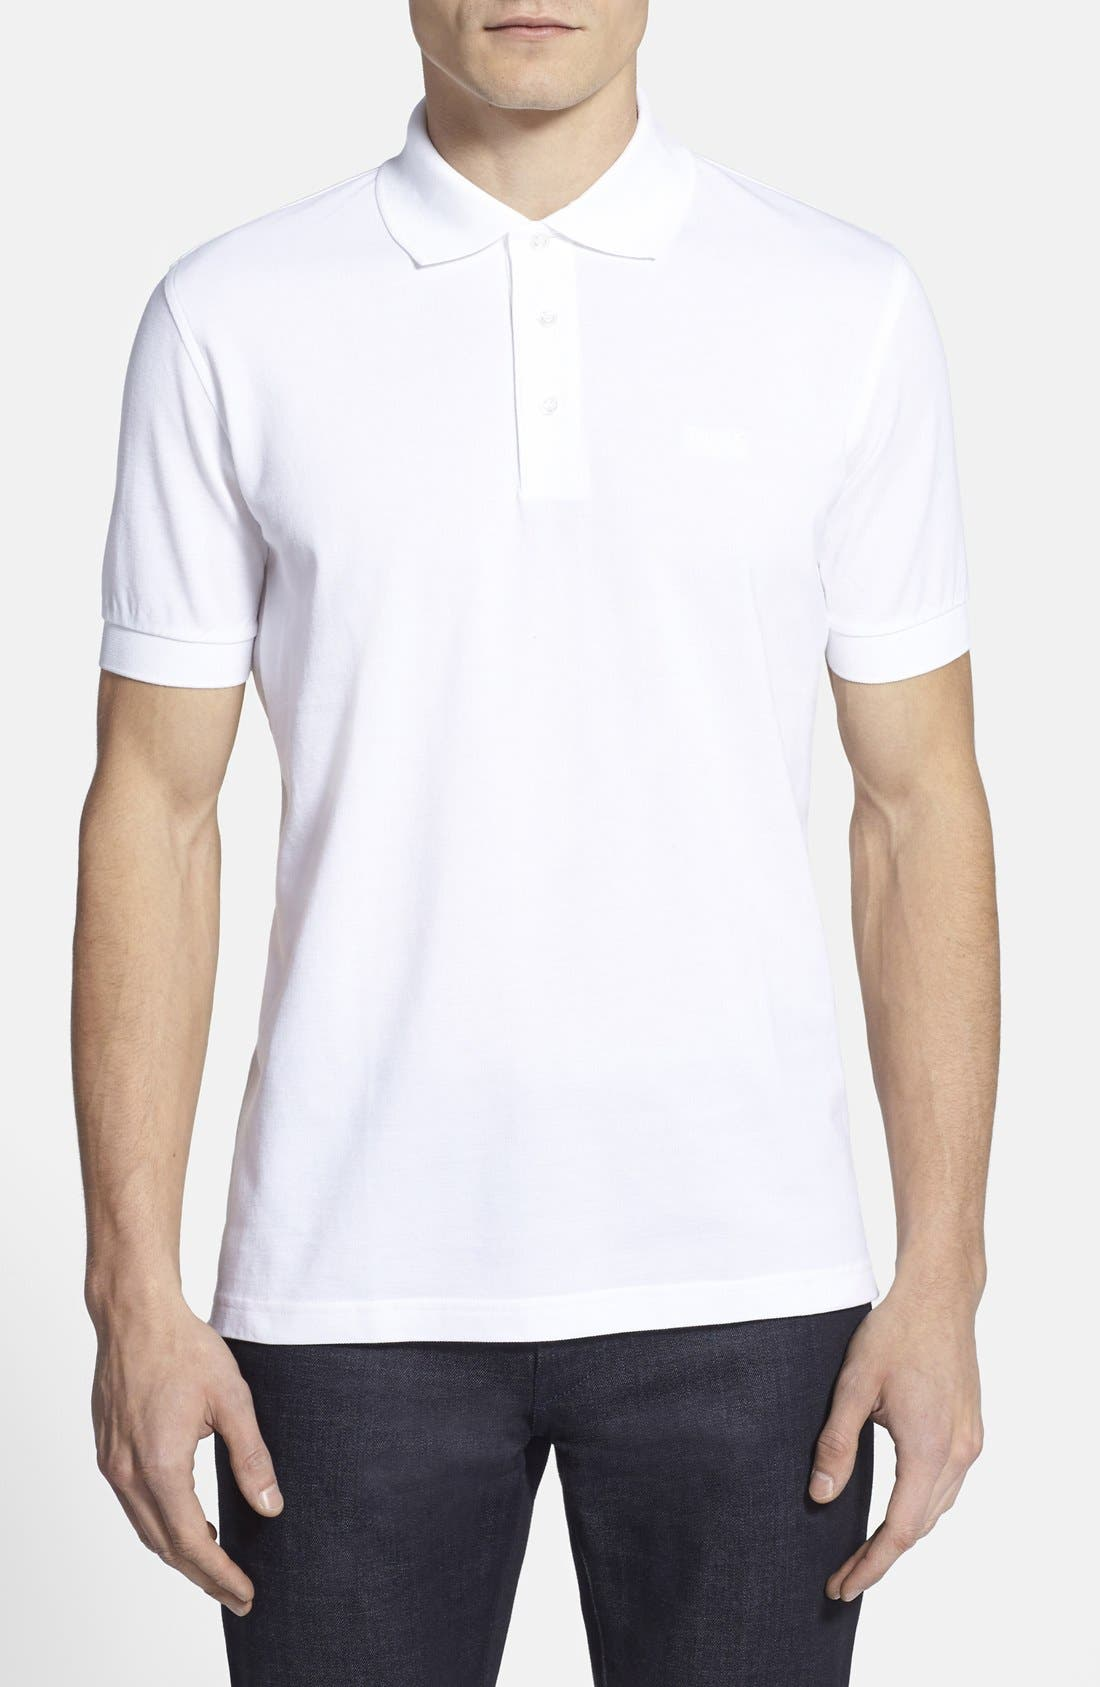 Alternate Image 1 Selected - BOSS 'Ferrara' Comfort Fit Piqué Polo (Online Only)